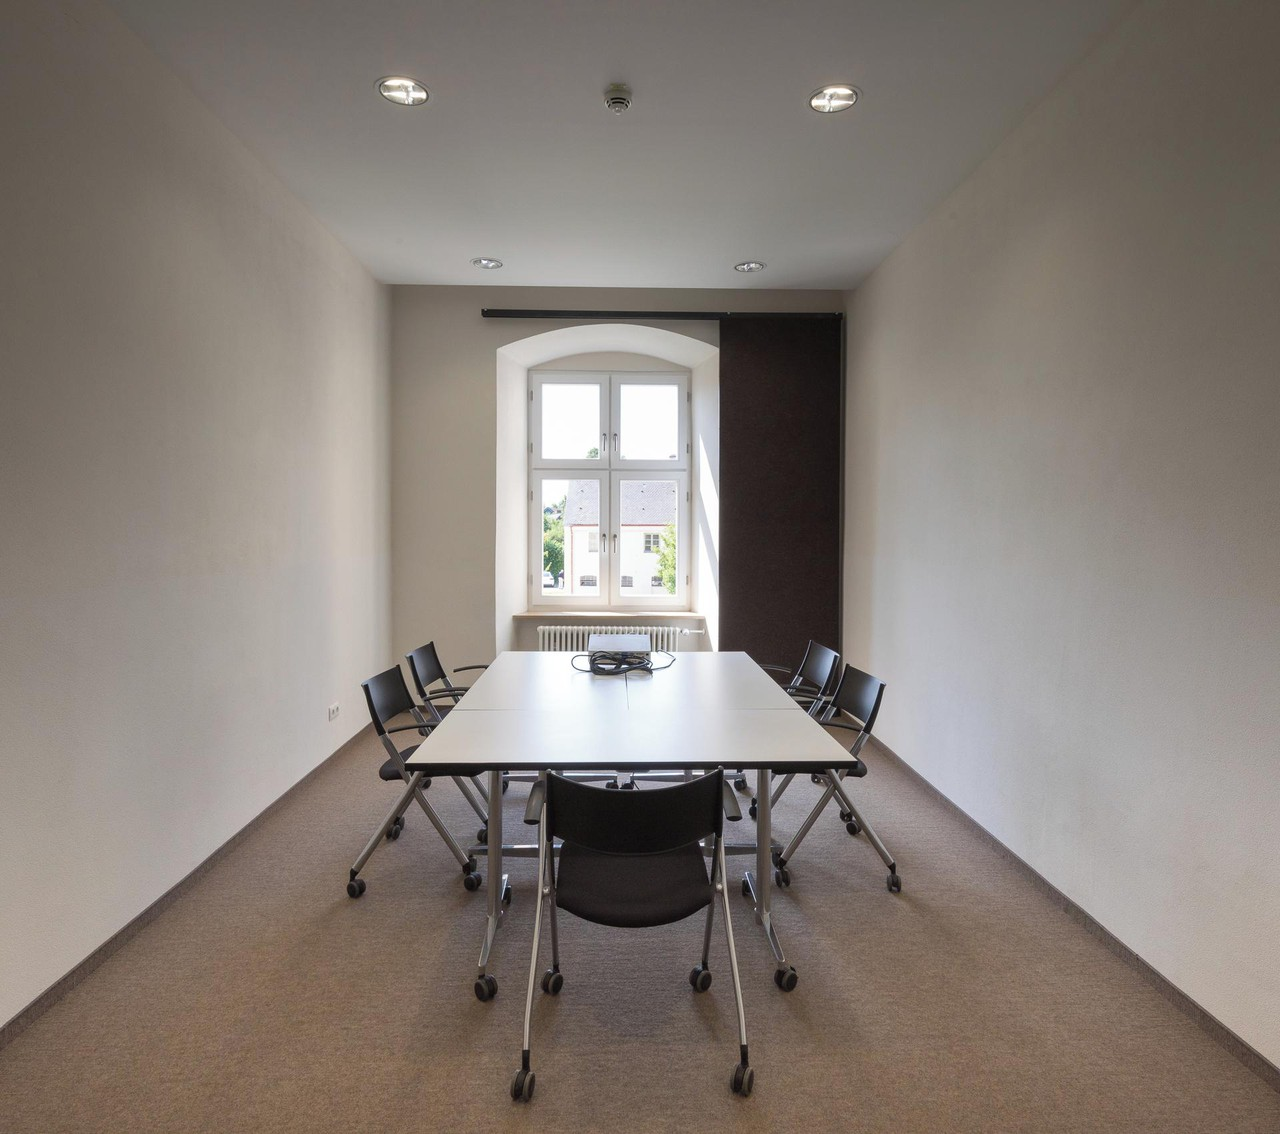 Augsburg  Meeting room Seminarraum 1 image 0